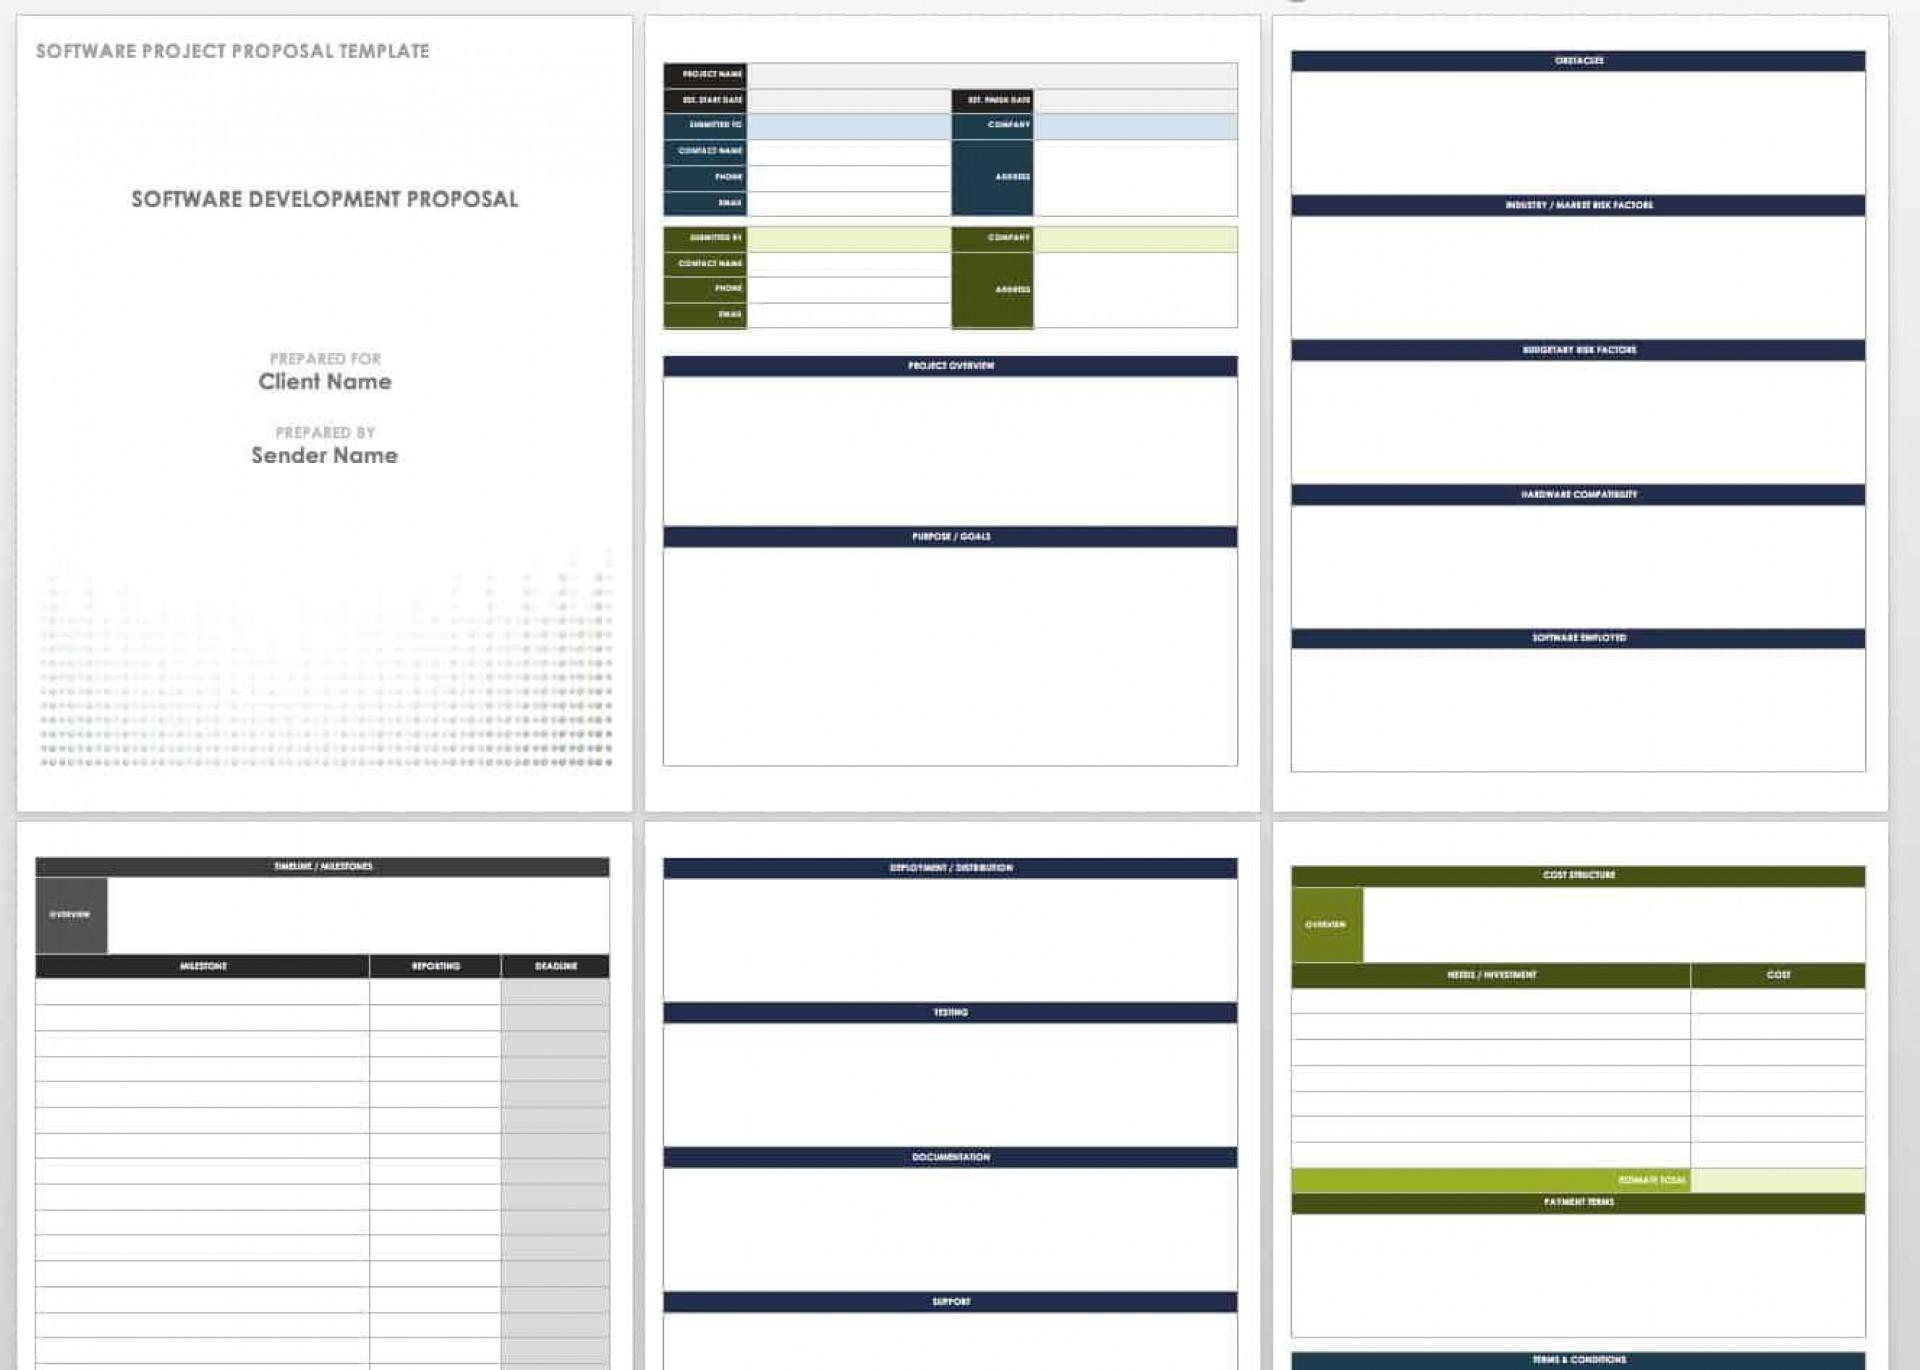 008 Stupendou Web Development Proposal Template Pdf Design  Sample1920